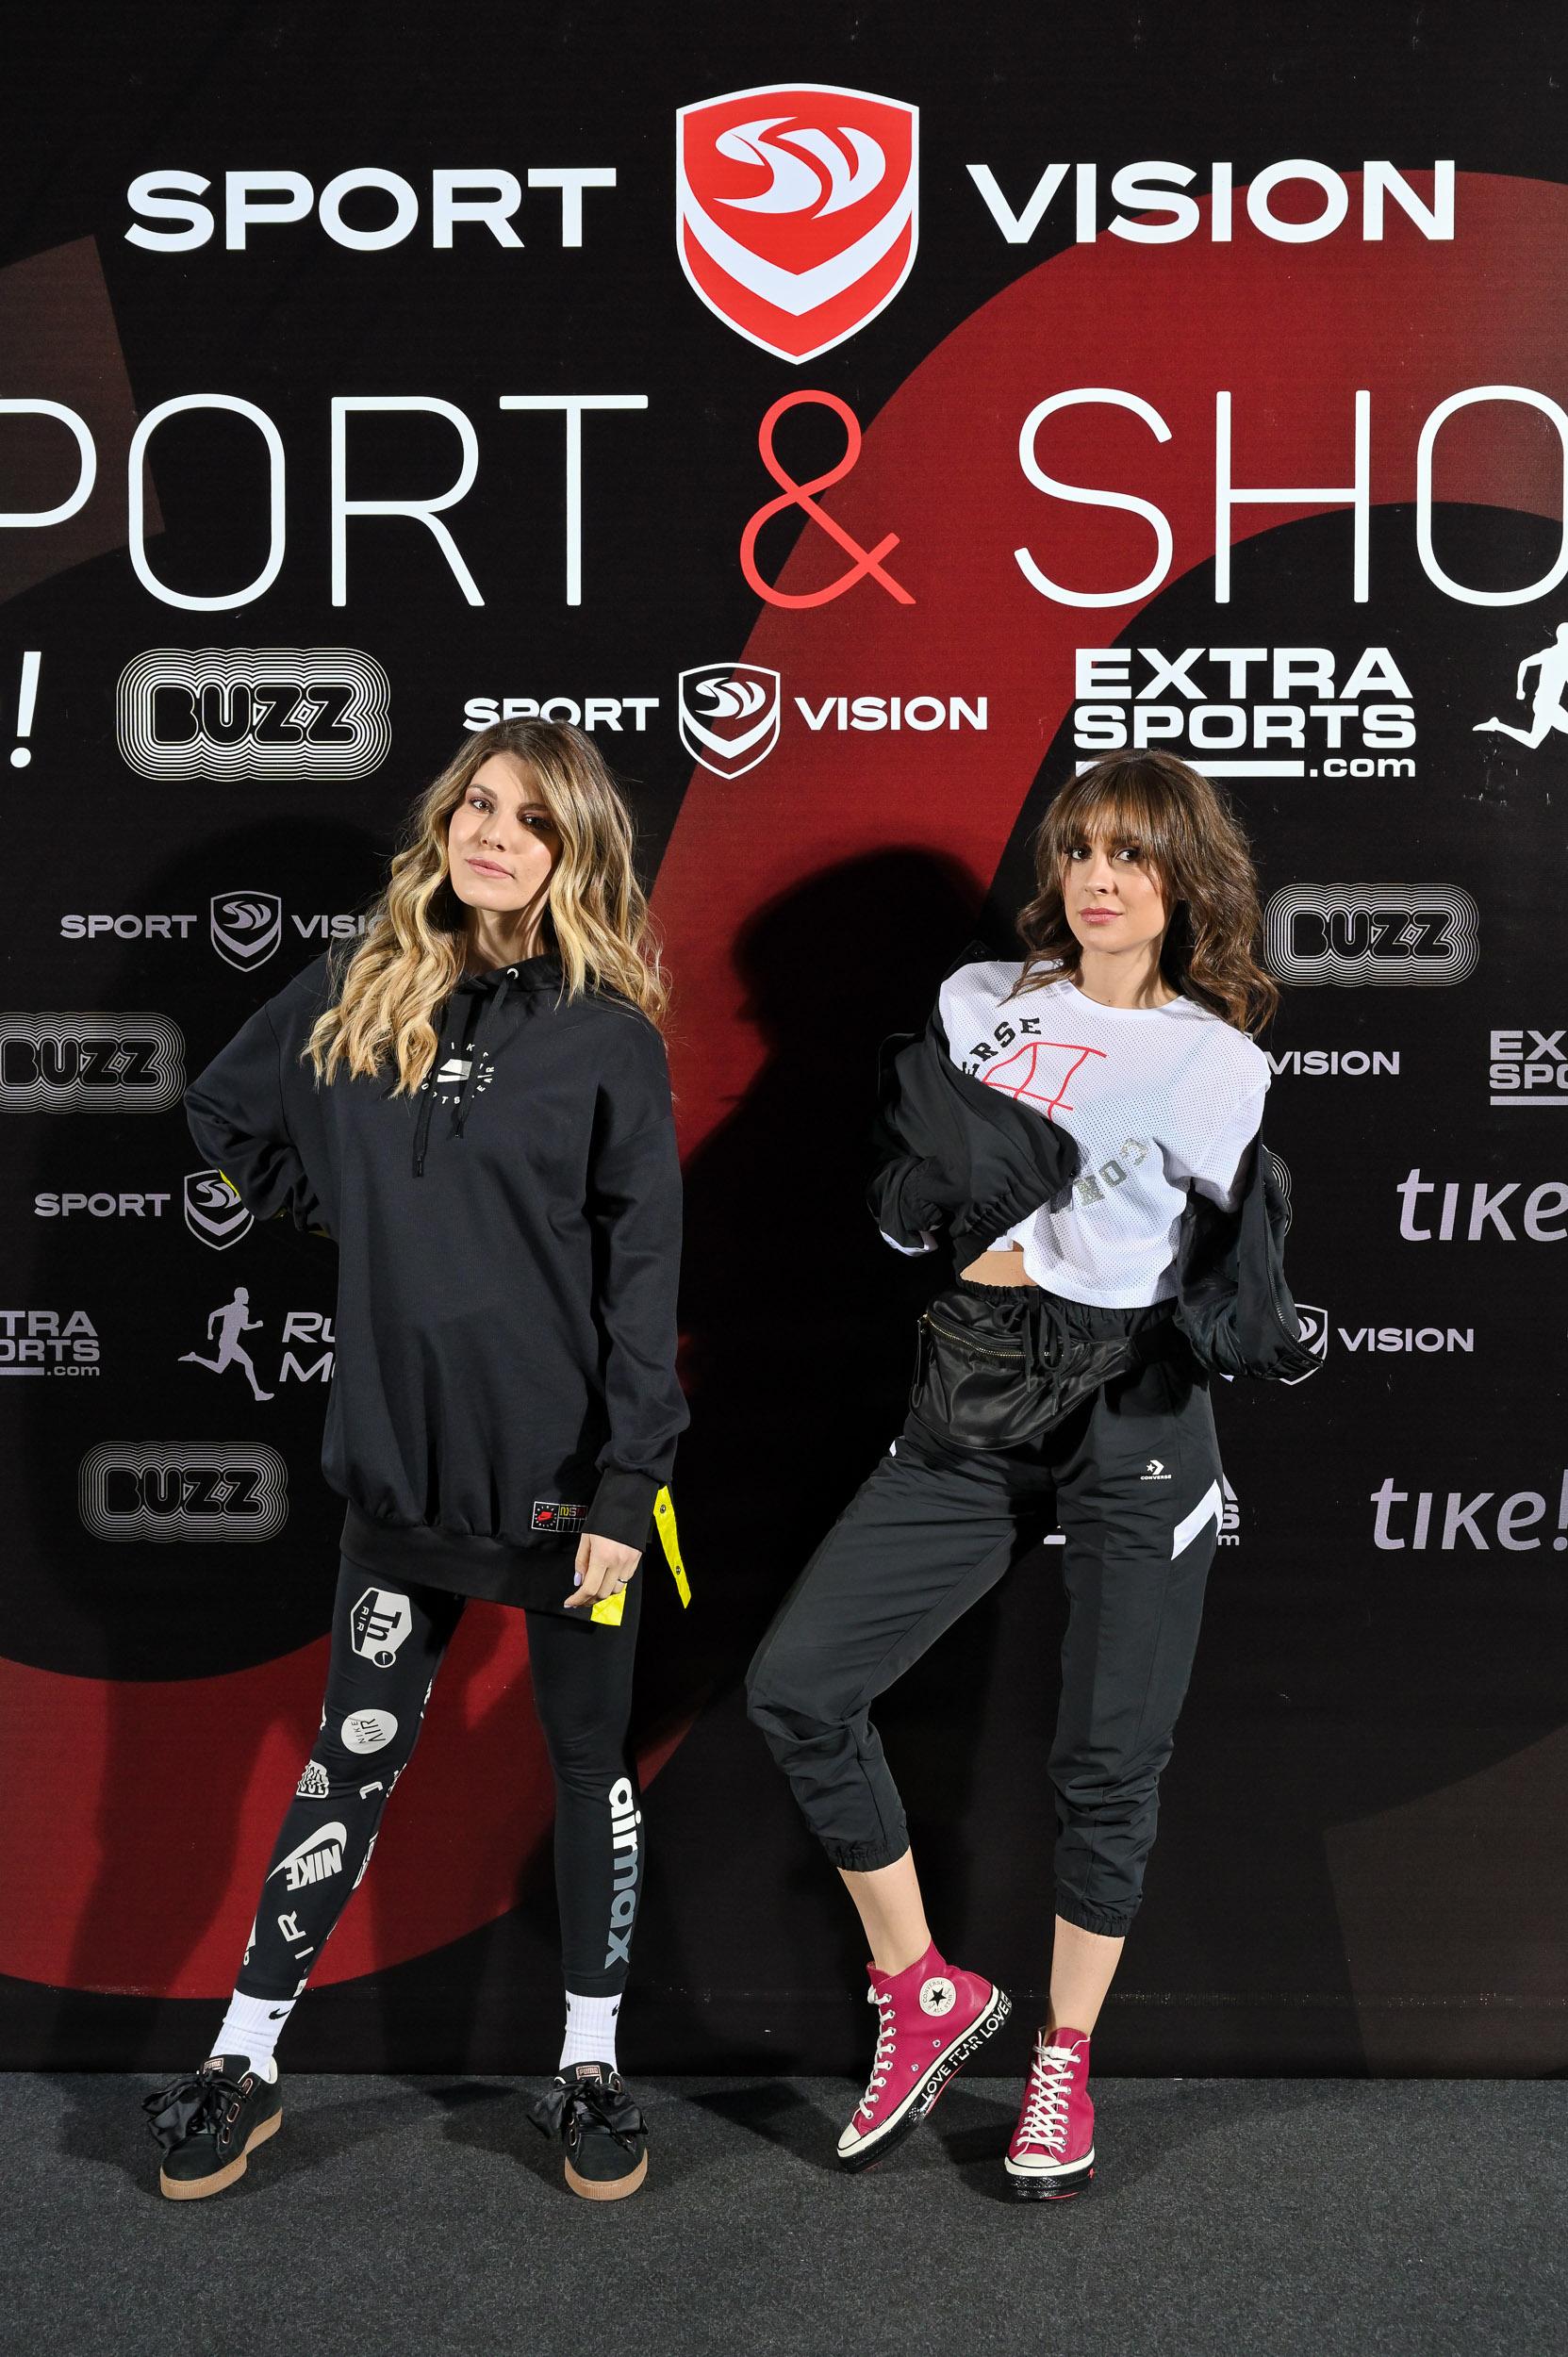 Tamara Dragicevic Dragana Micalovic Sportsko modni spektakl u znaku Sport Vision a